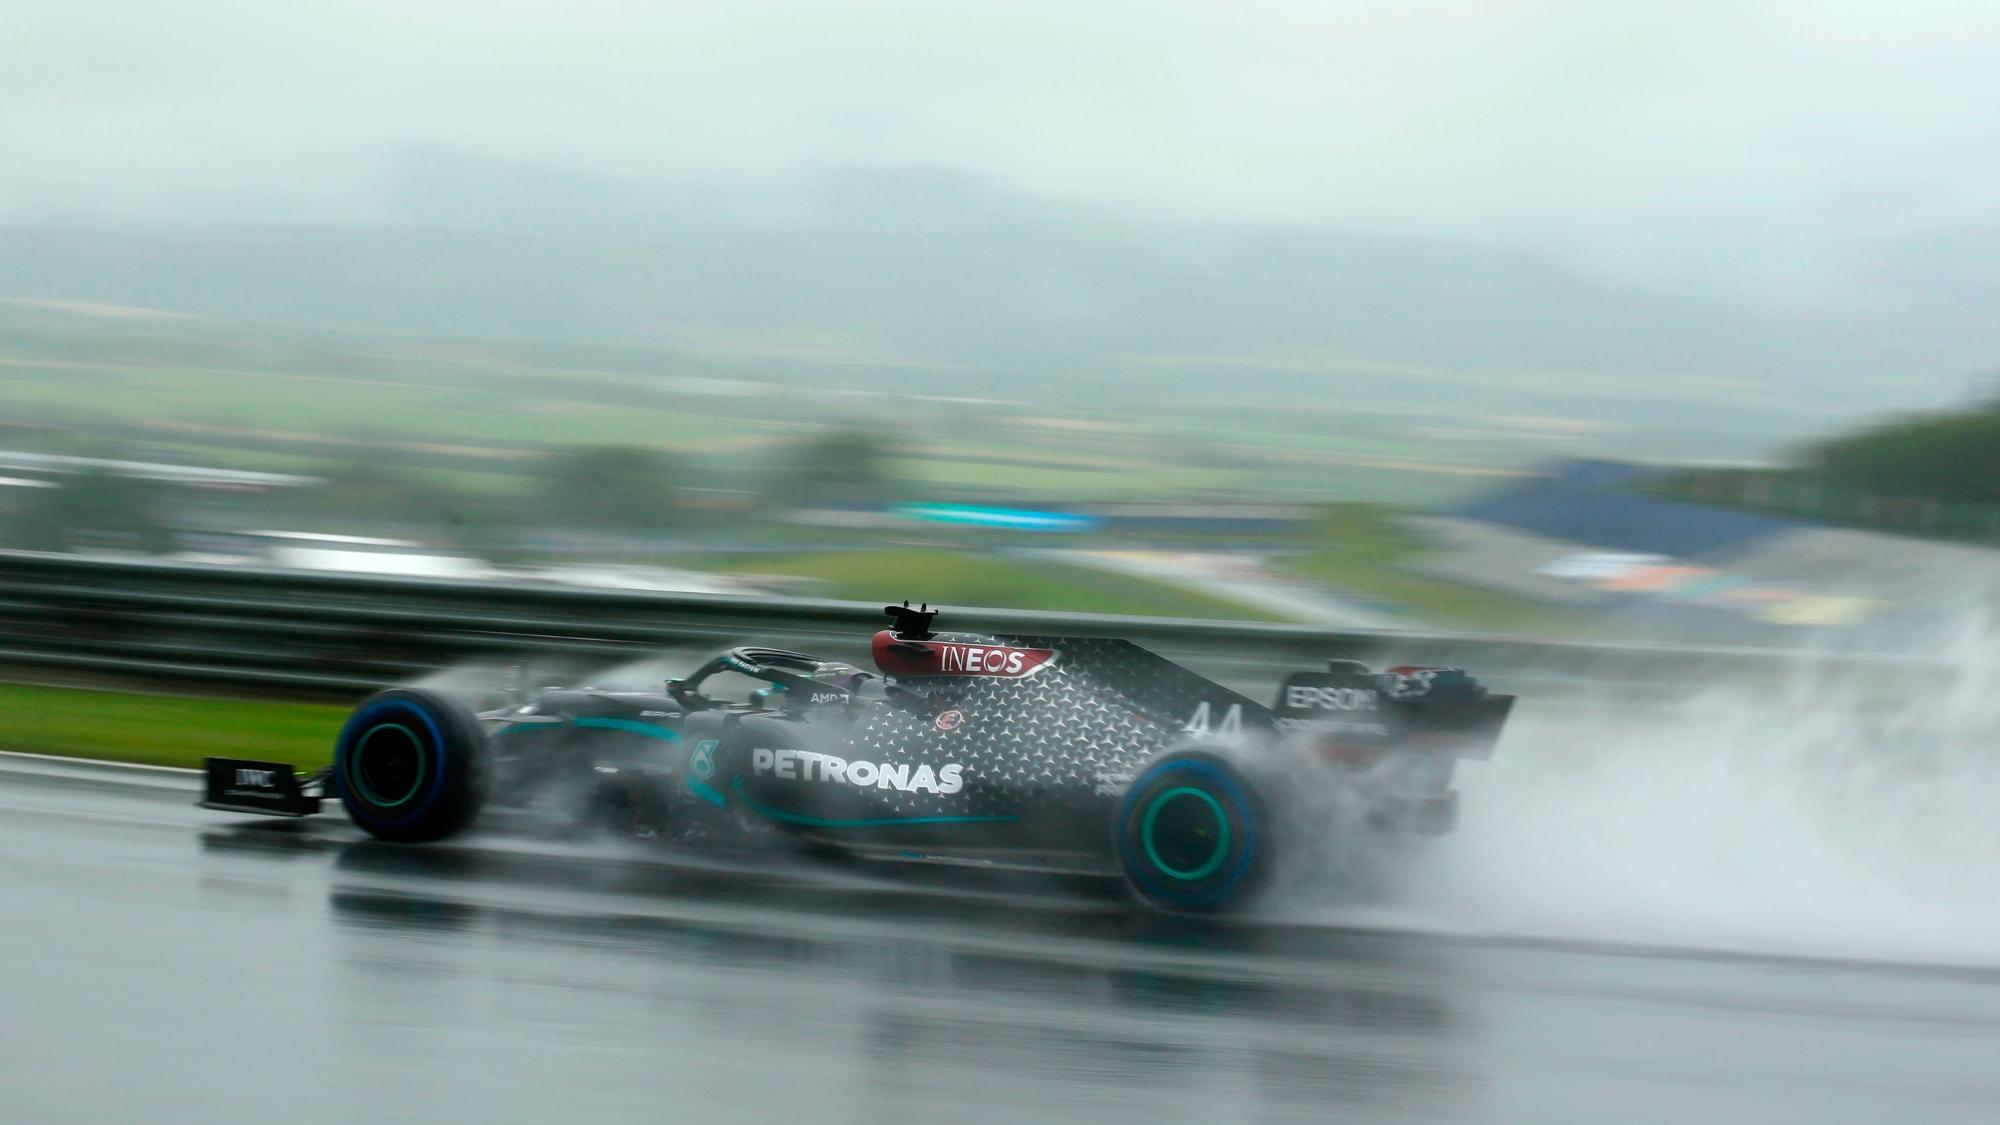 Lewis Hamilton, 2020 Styrian GP Qualifying